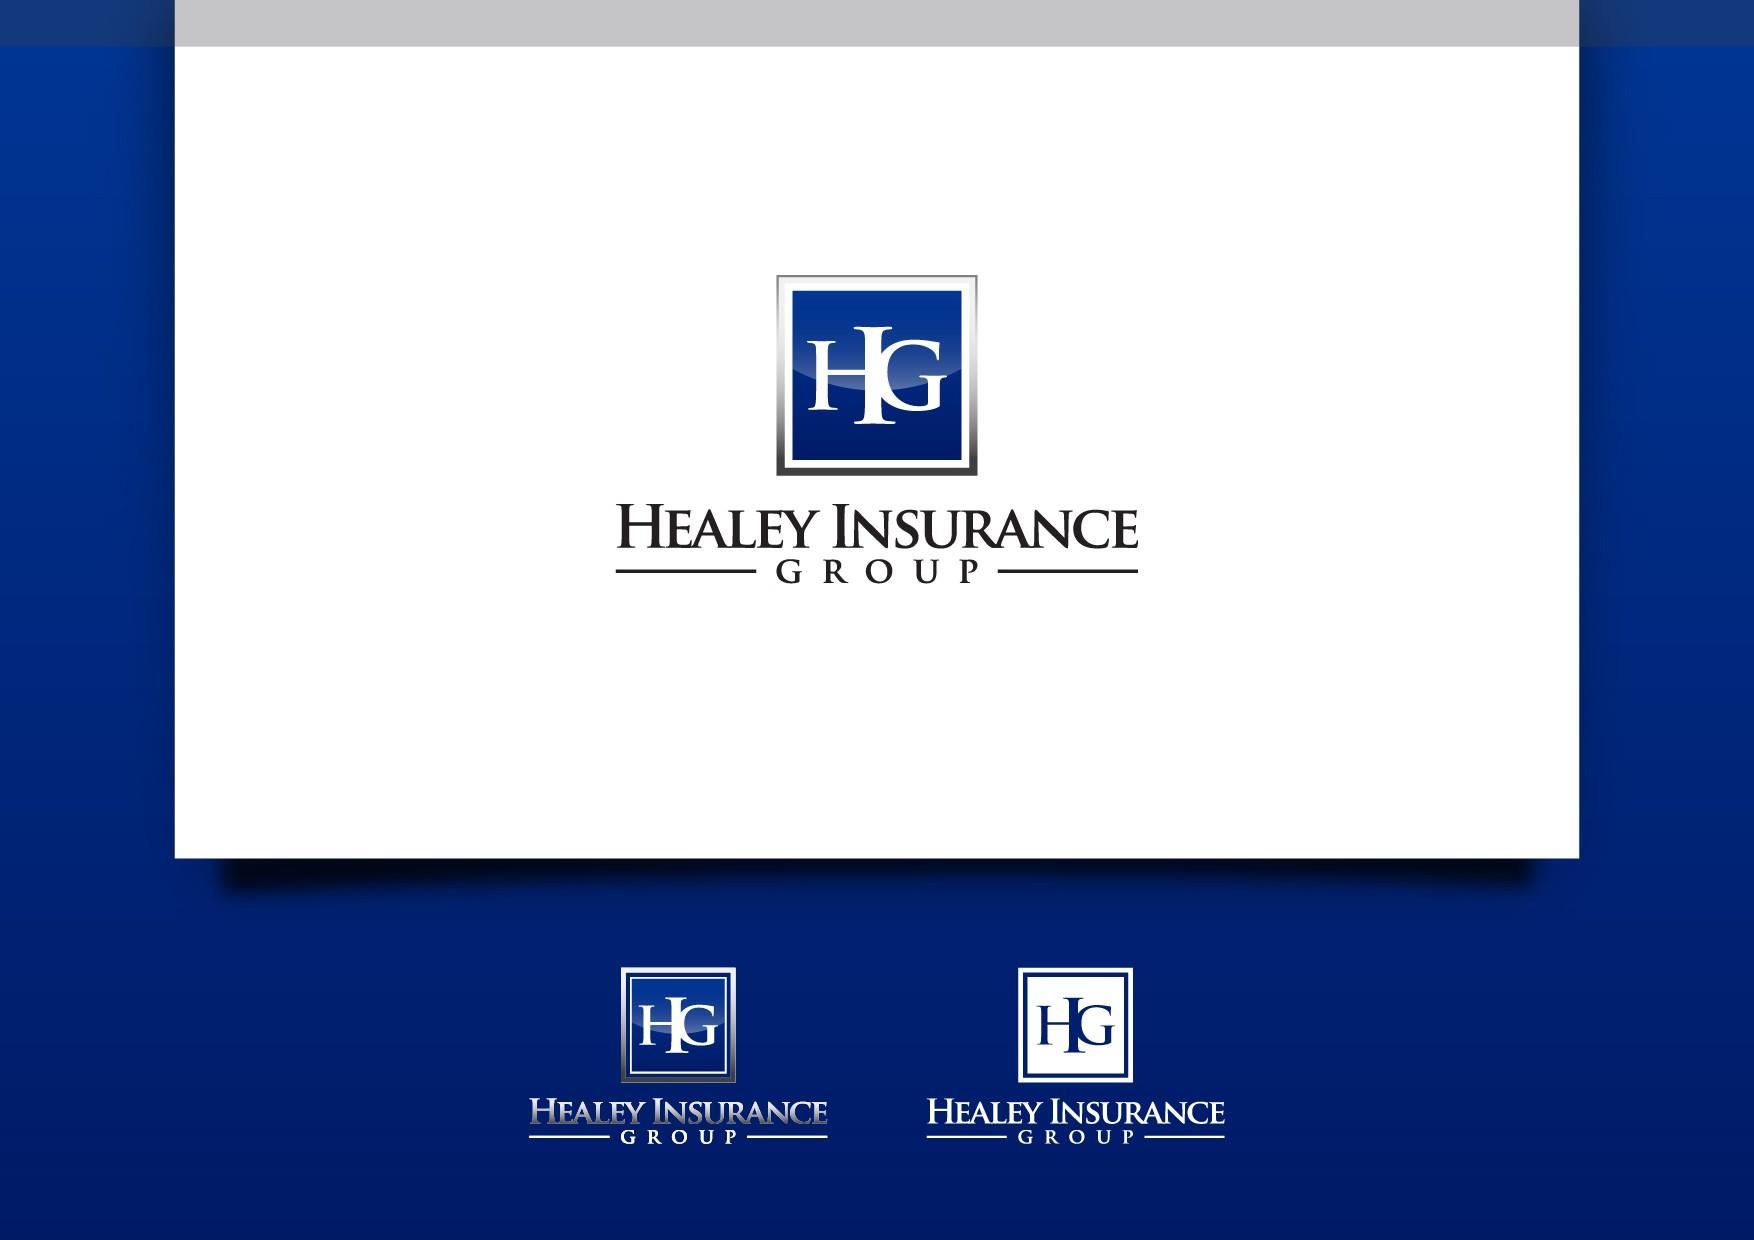 Healey Insurance Group